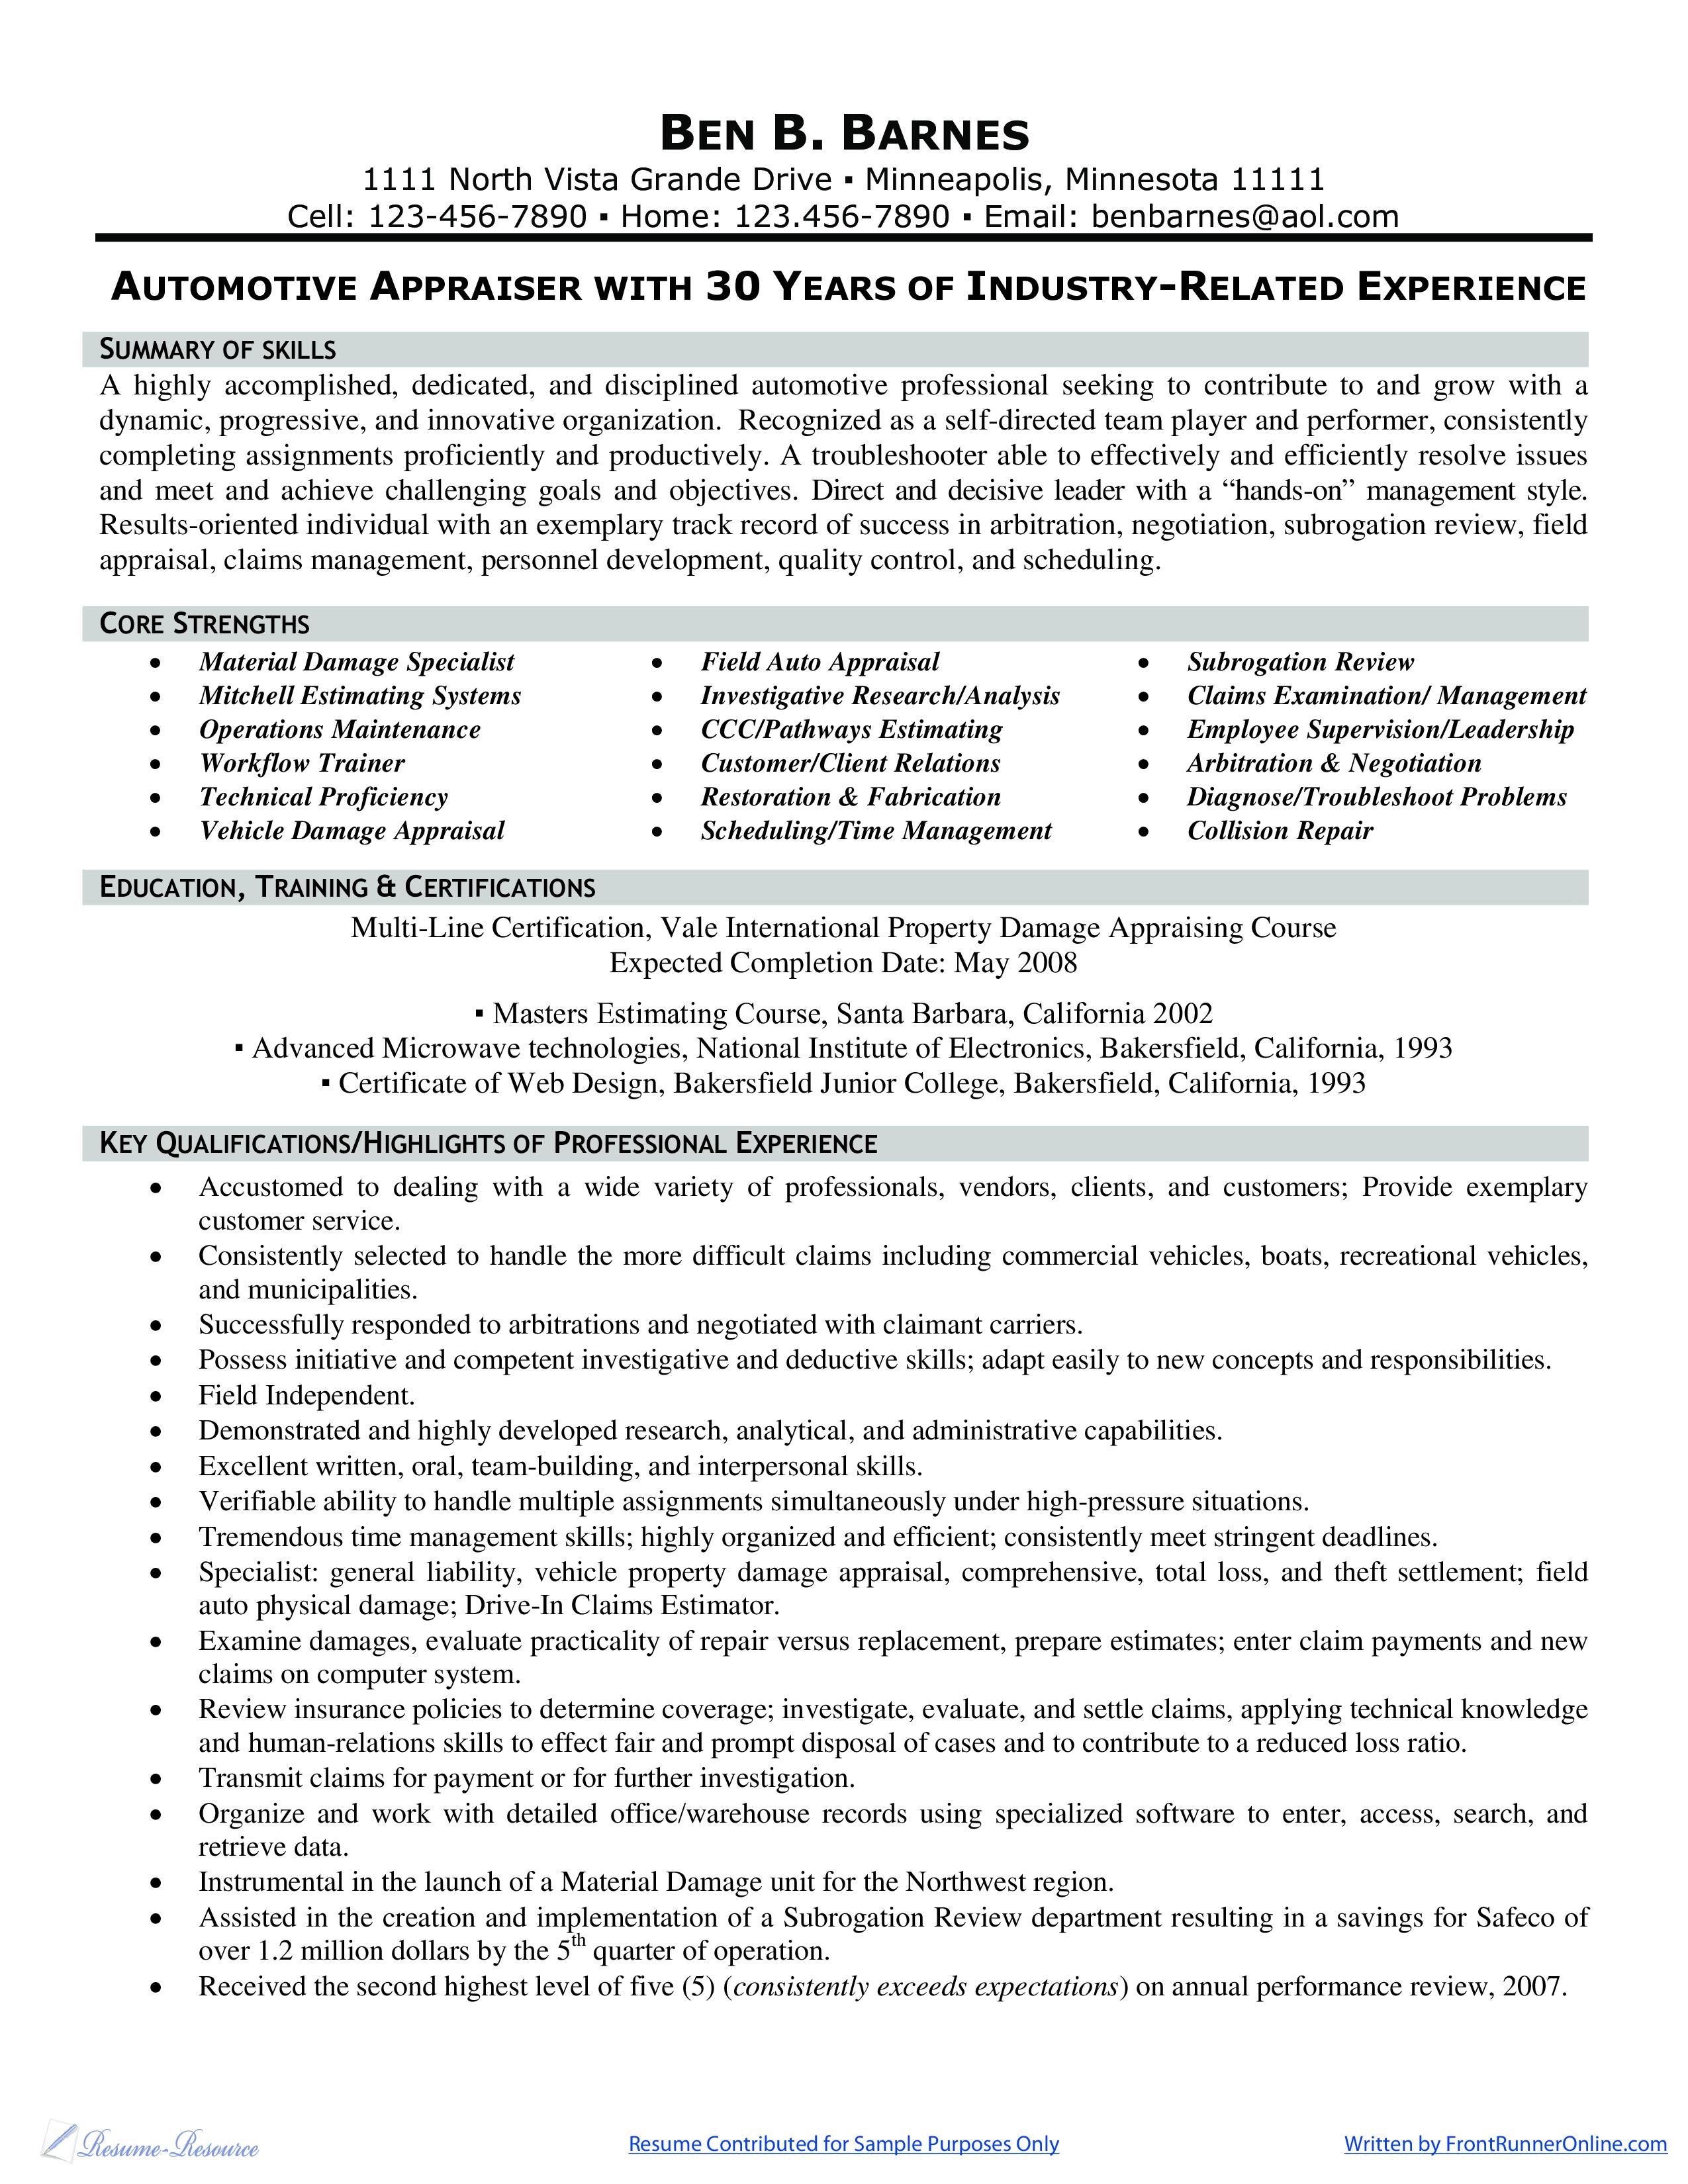 Free Automotive Appraiser Adjuster Resume Templates At